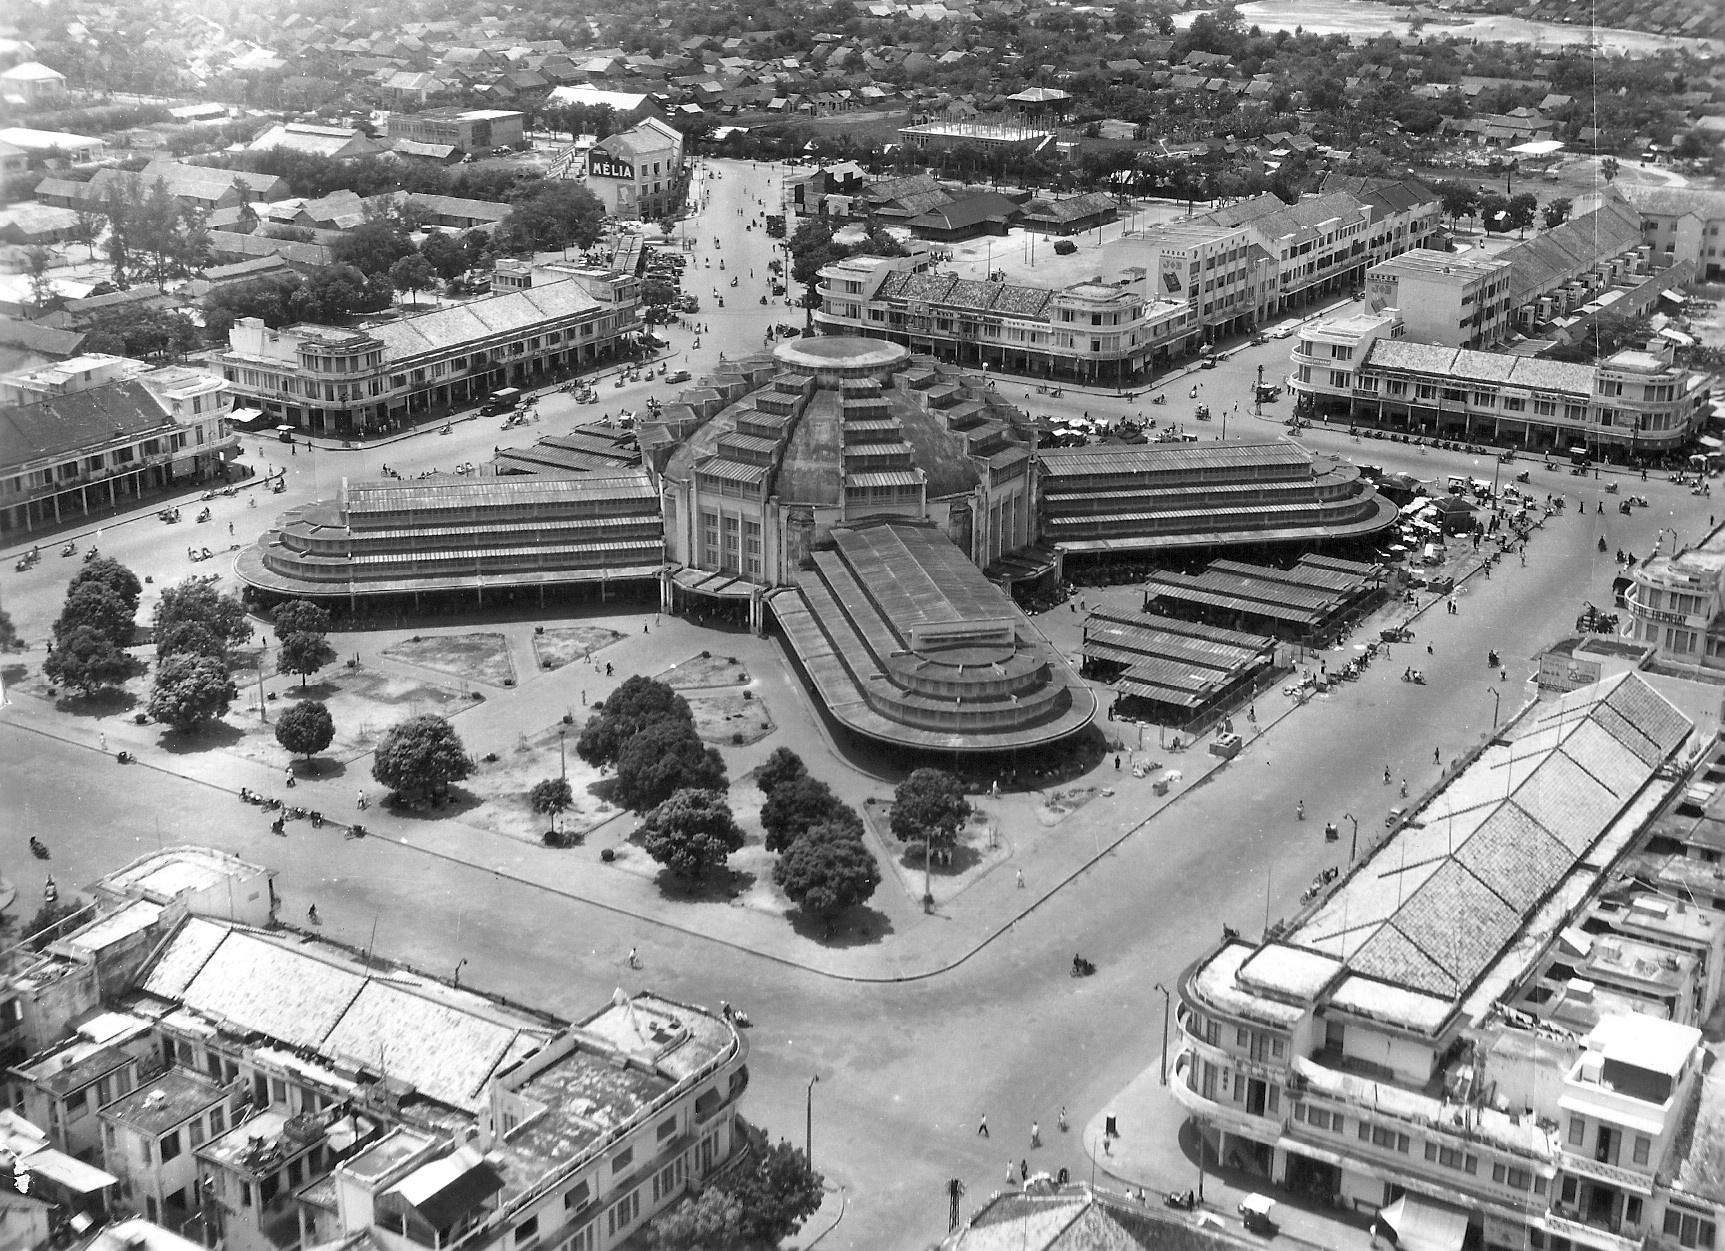 [Photos] Bird's-eye view: Aerial photos of 1953 Indochina